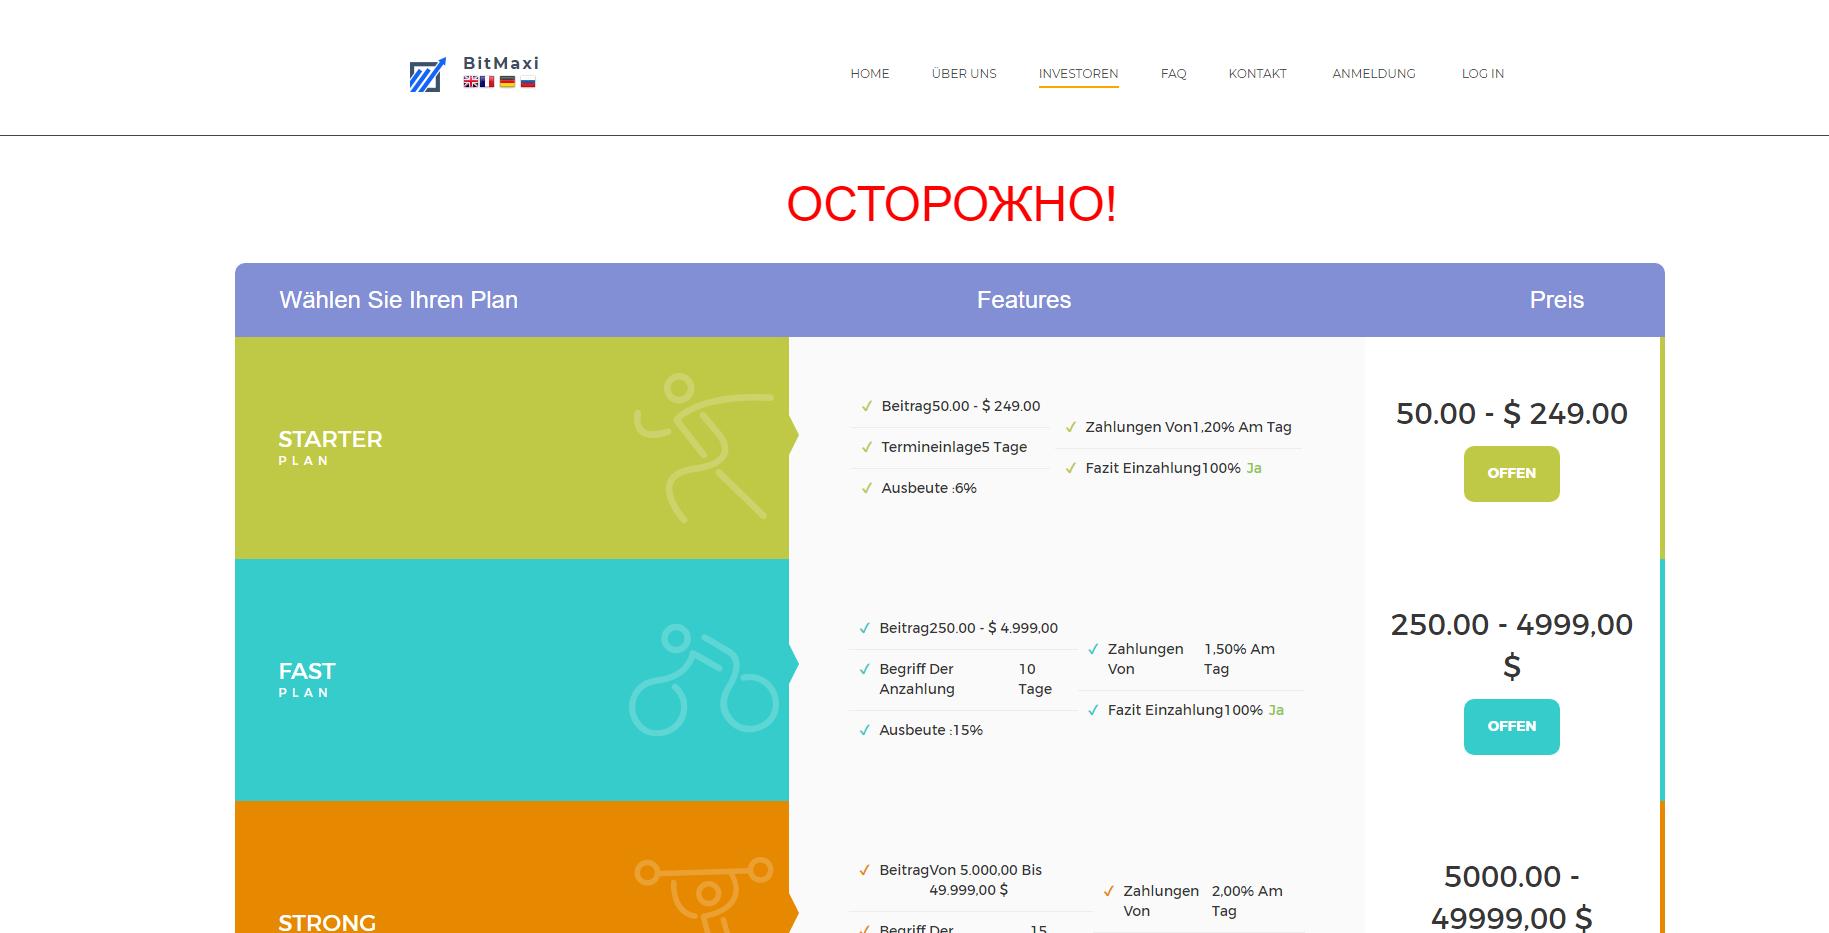 Bitmaxi - обзор и отзывы о bitmaxi-capital.ru